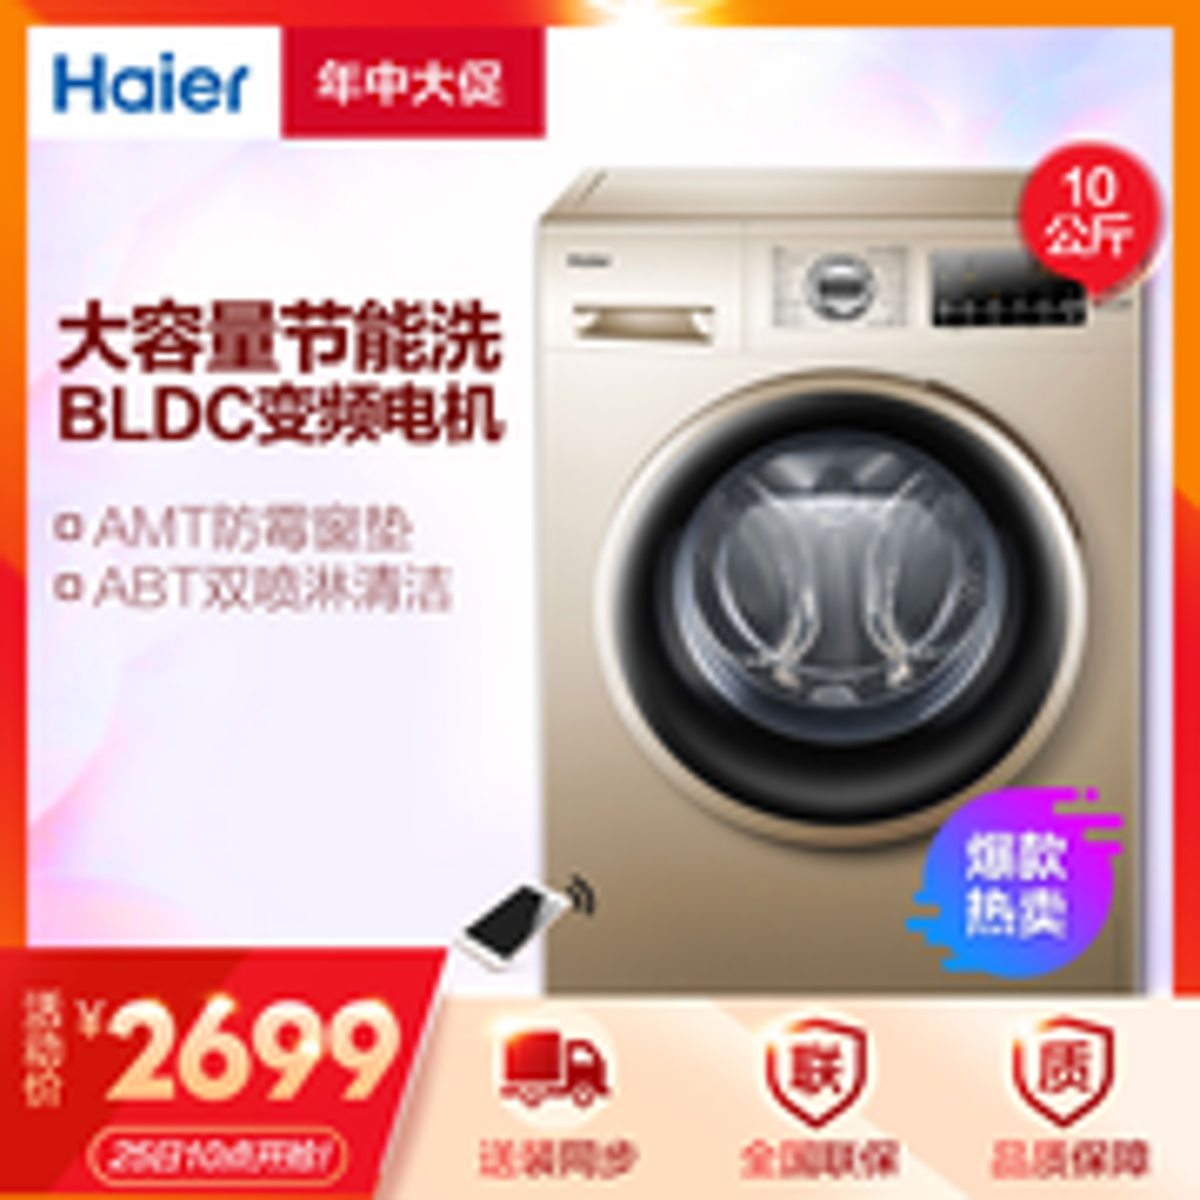 EG10014B39GU1 10公斤/kg鸿运国际hv522变频滚筒全自动洗衣机